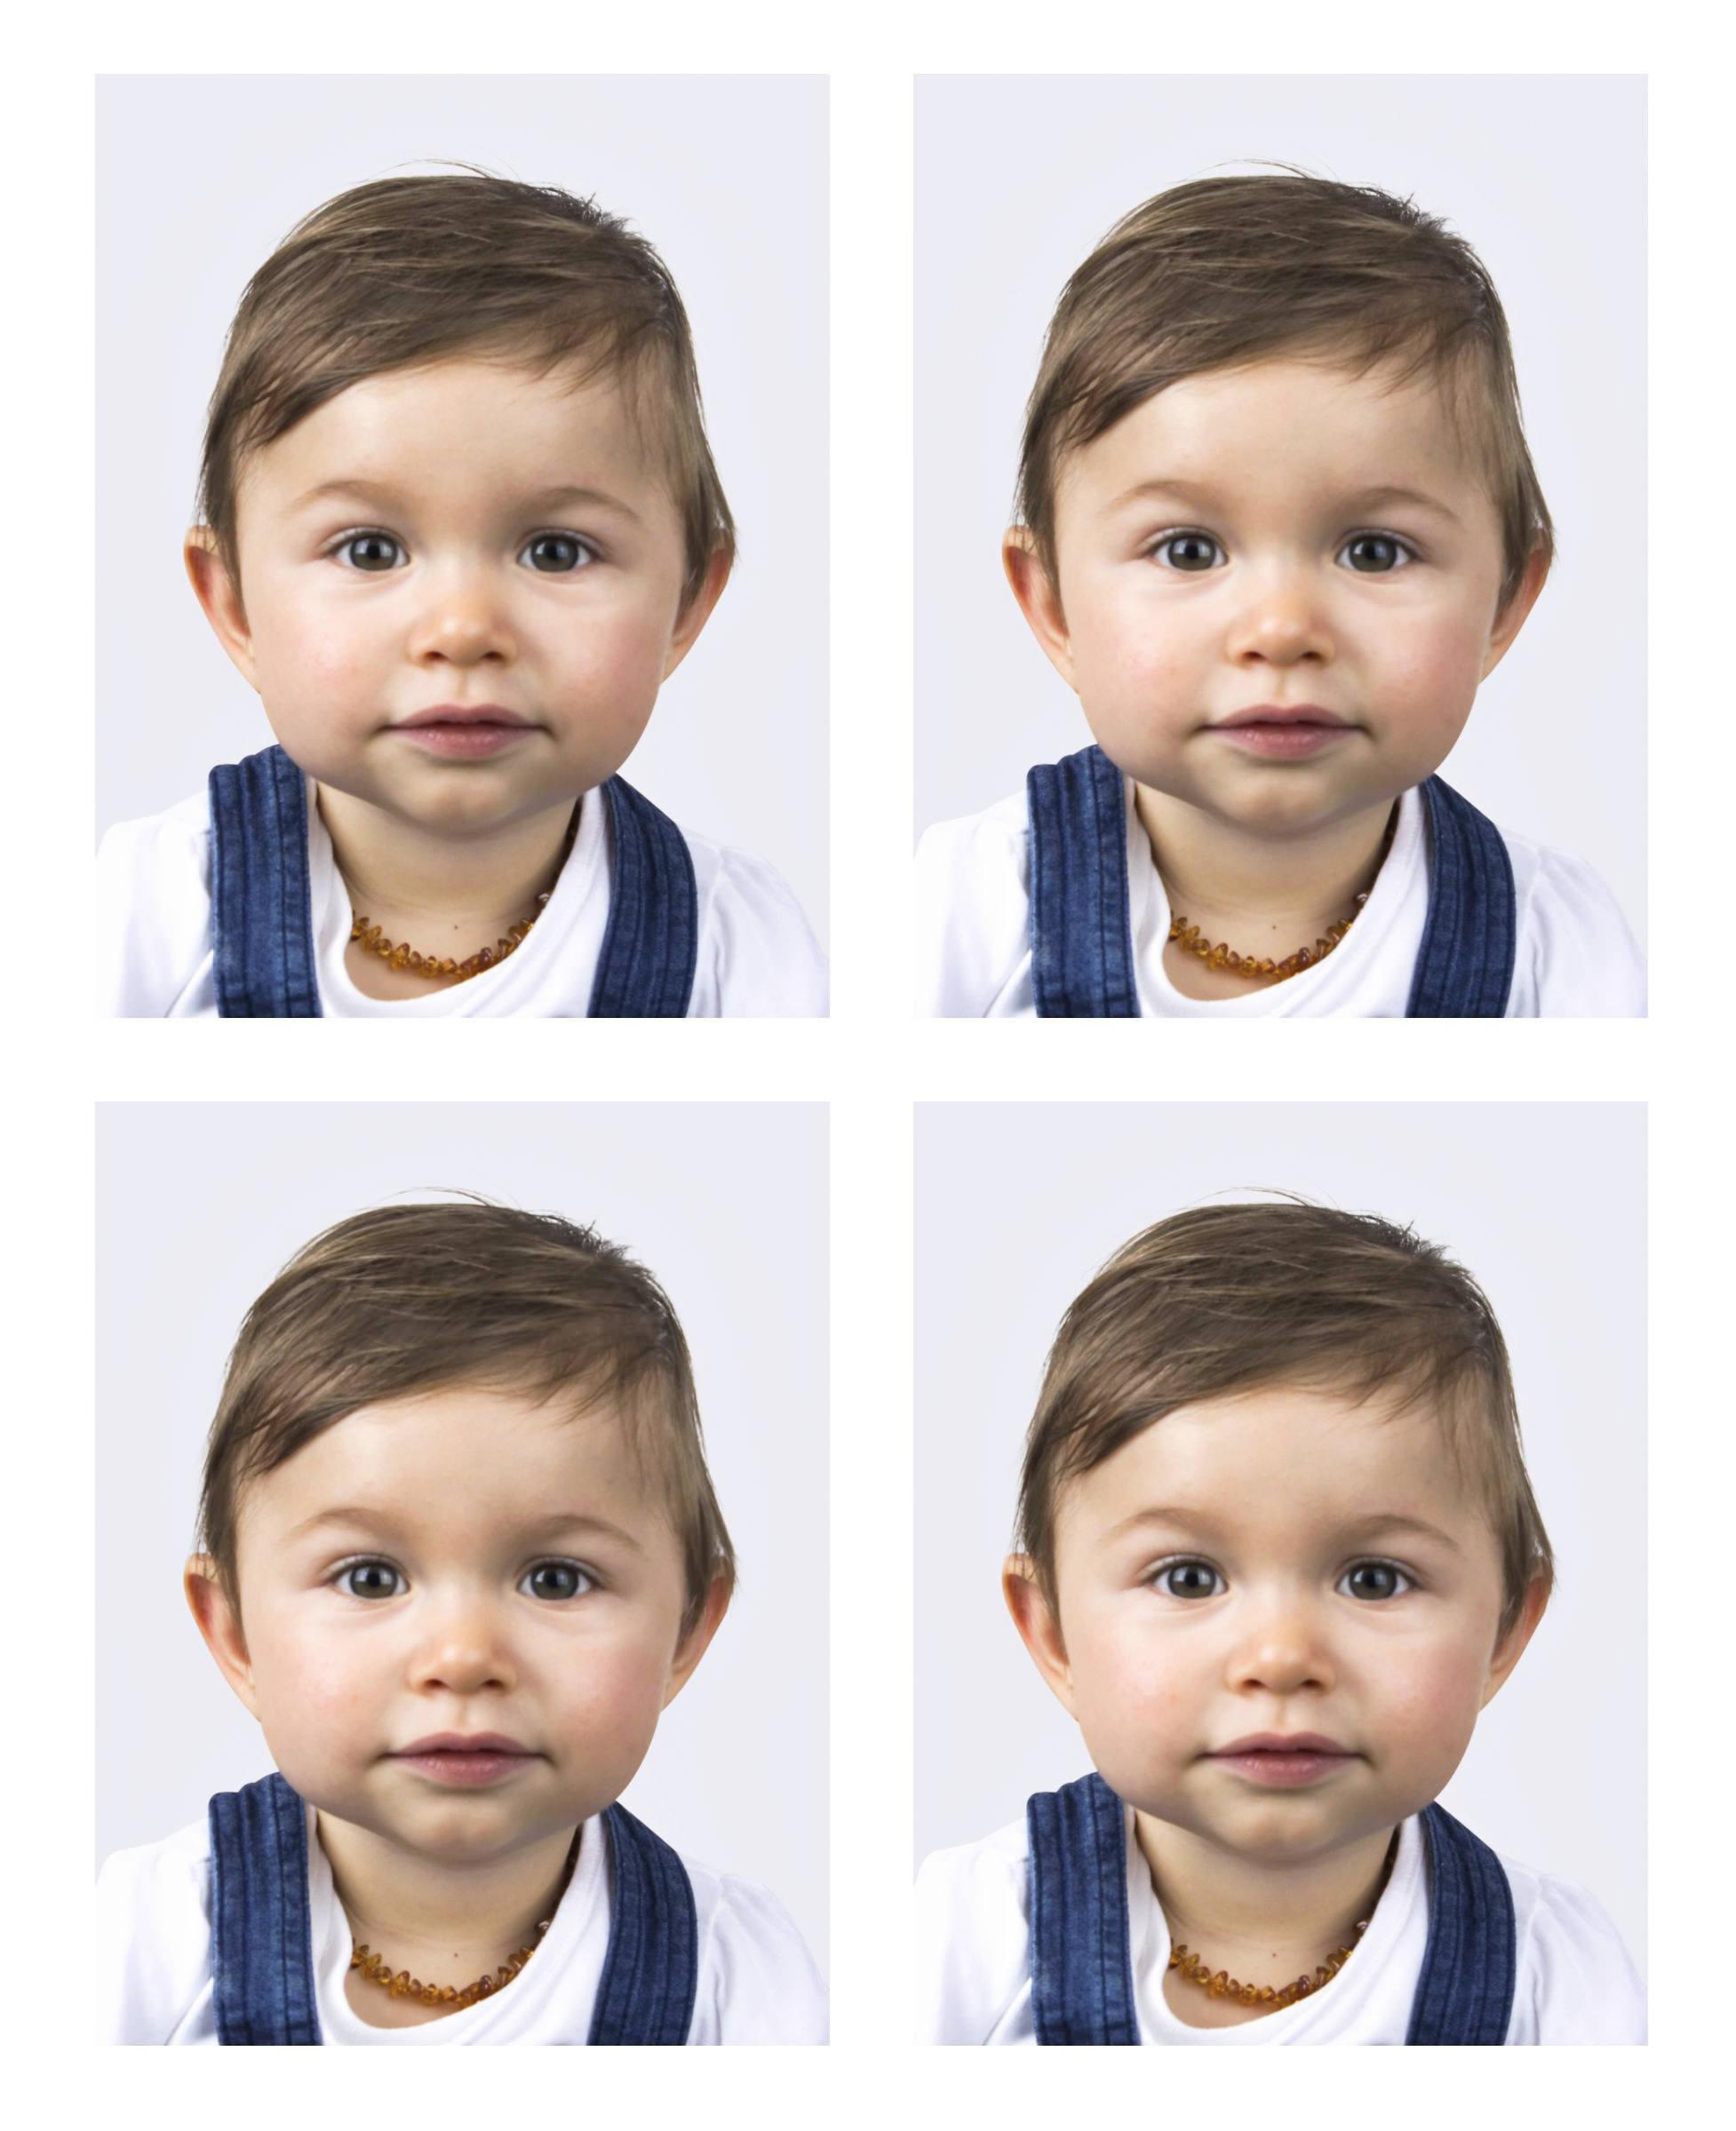 Photos passeport enfant, Belgique, France, Europe